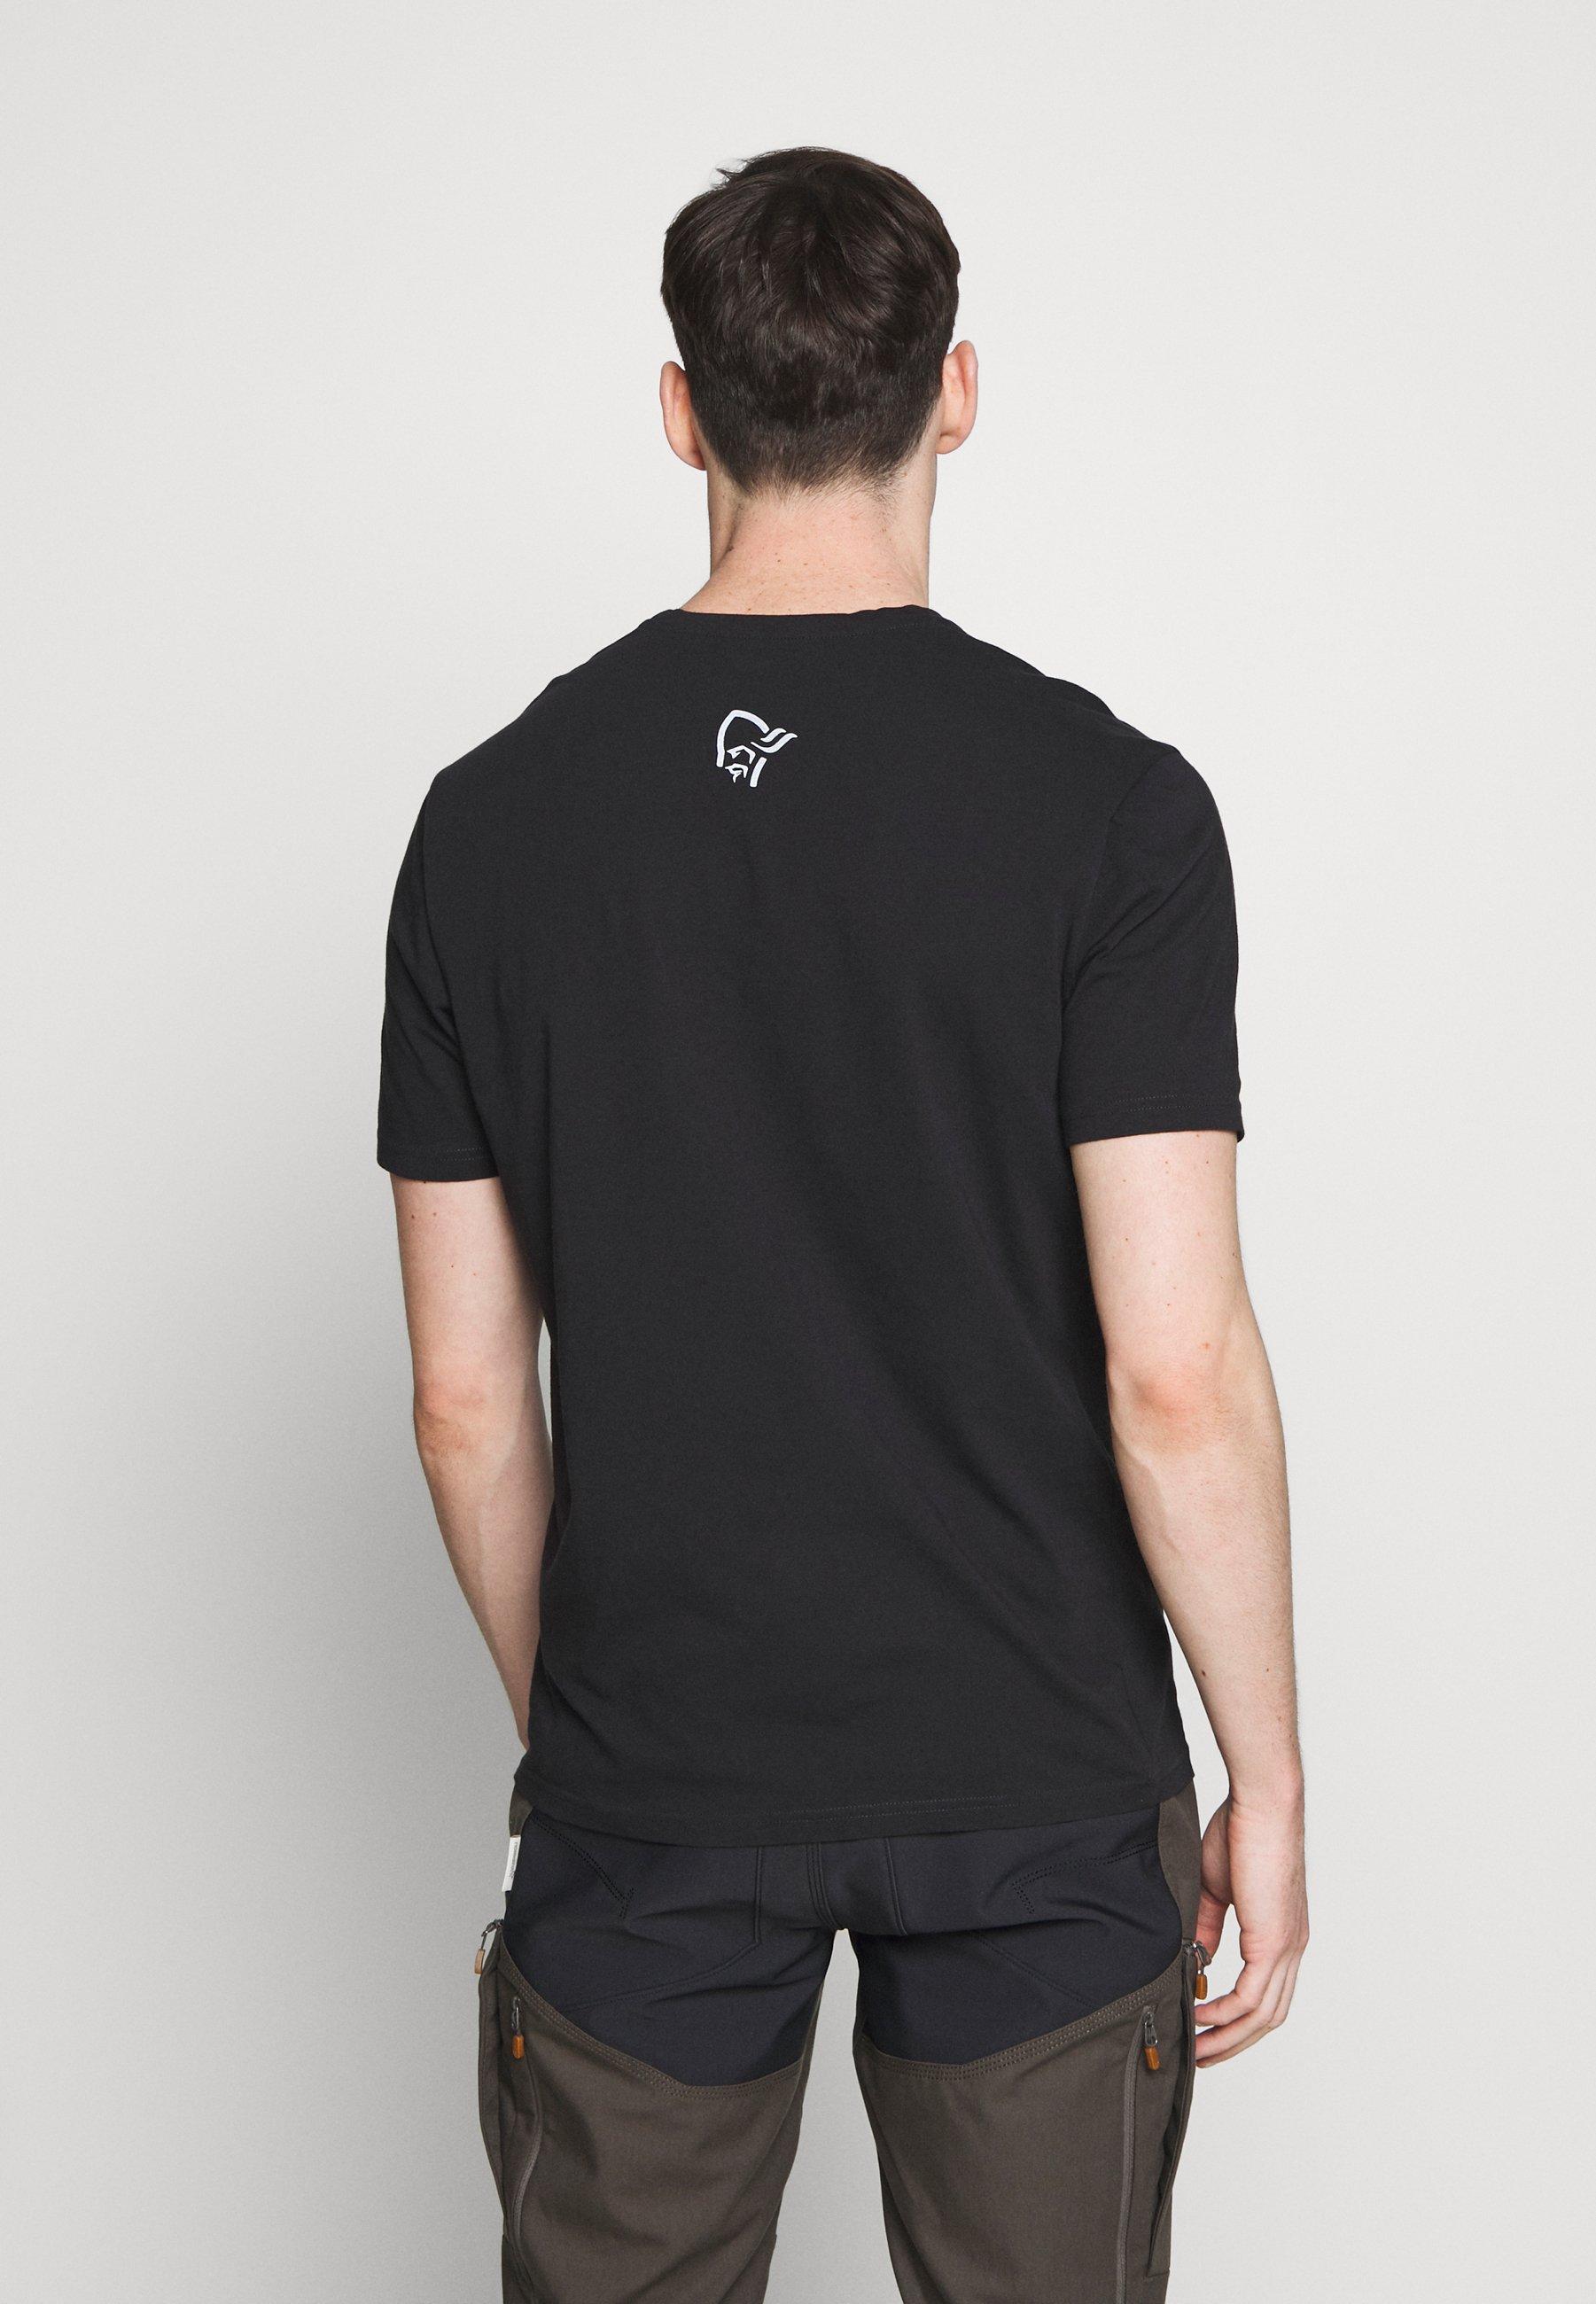 Norrøna Range - T-shirt Med Print Caviar